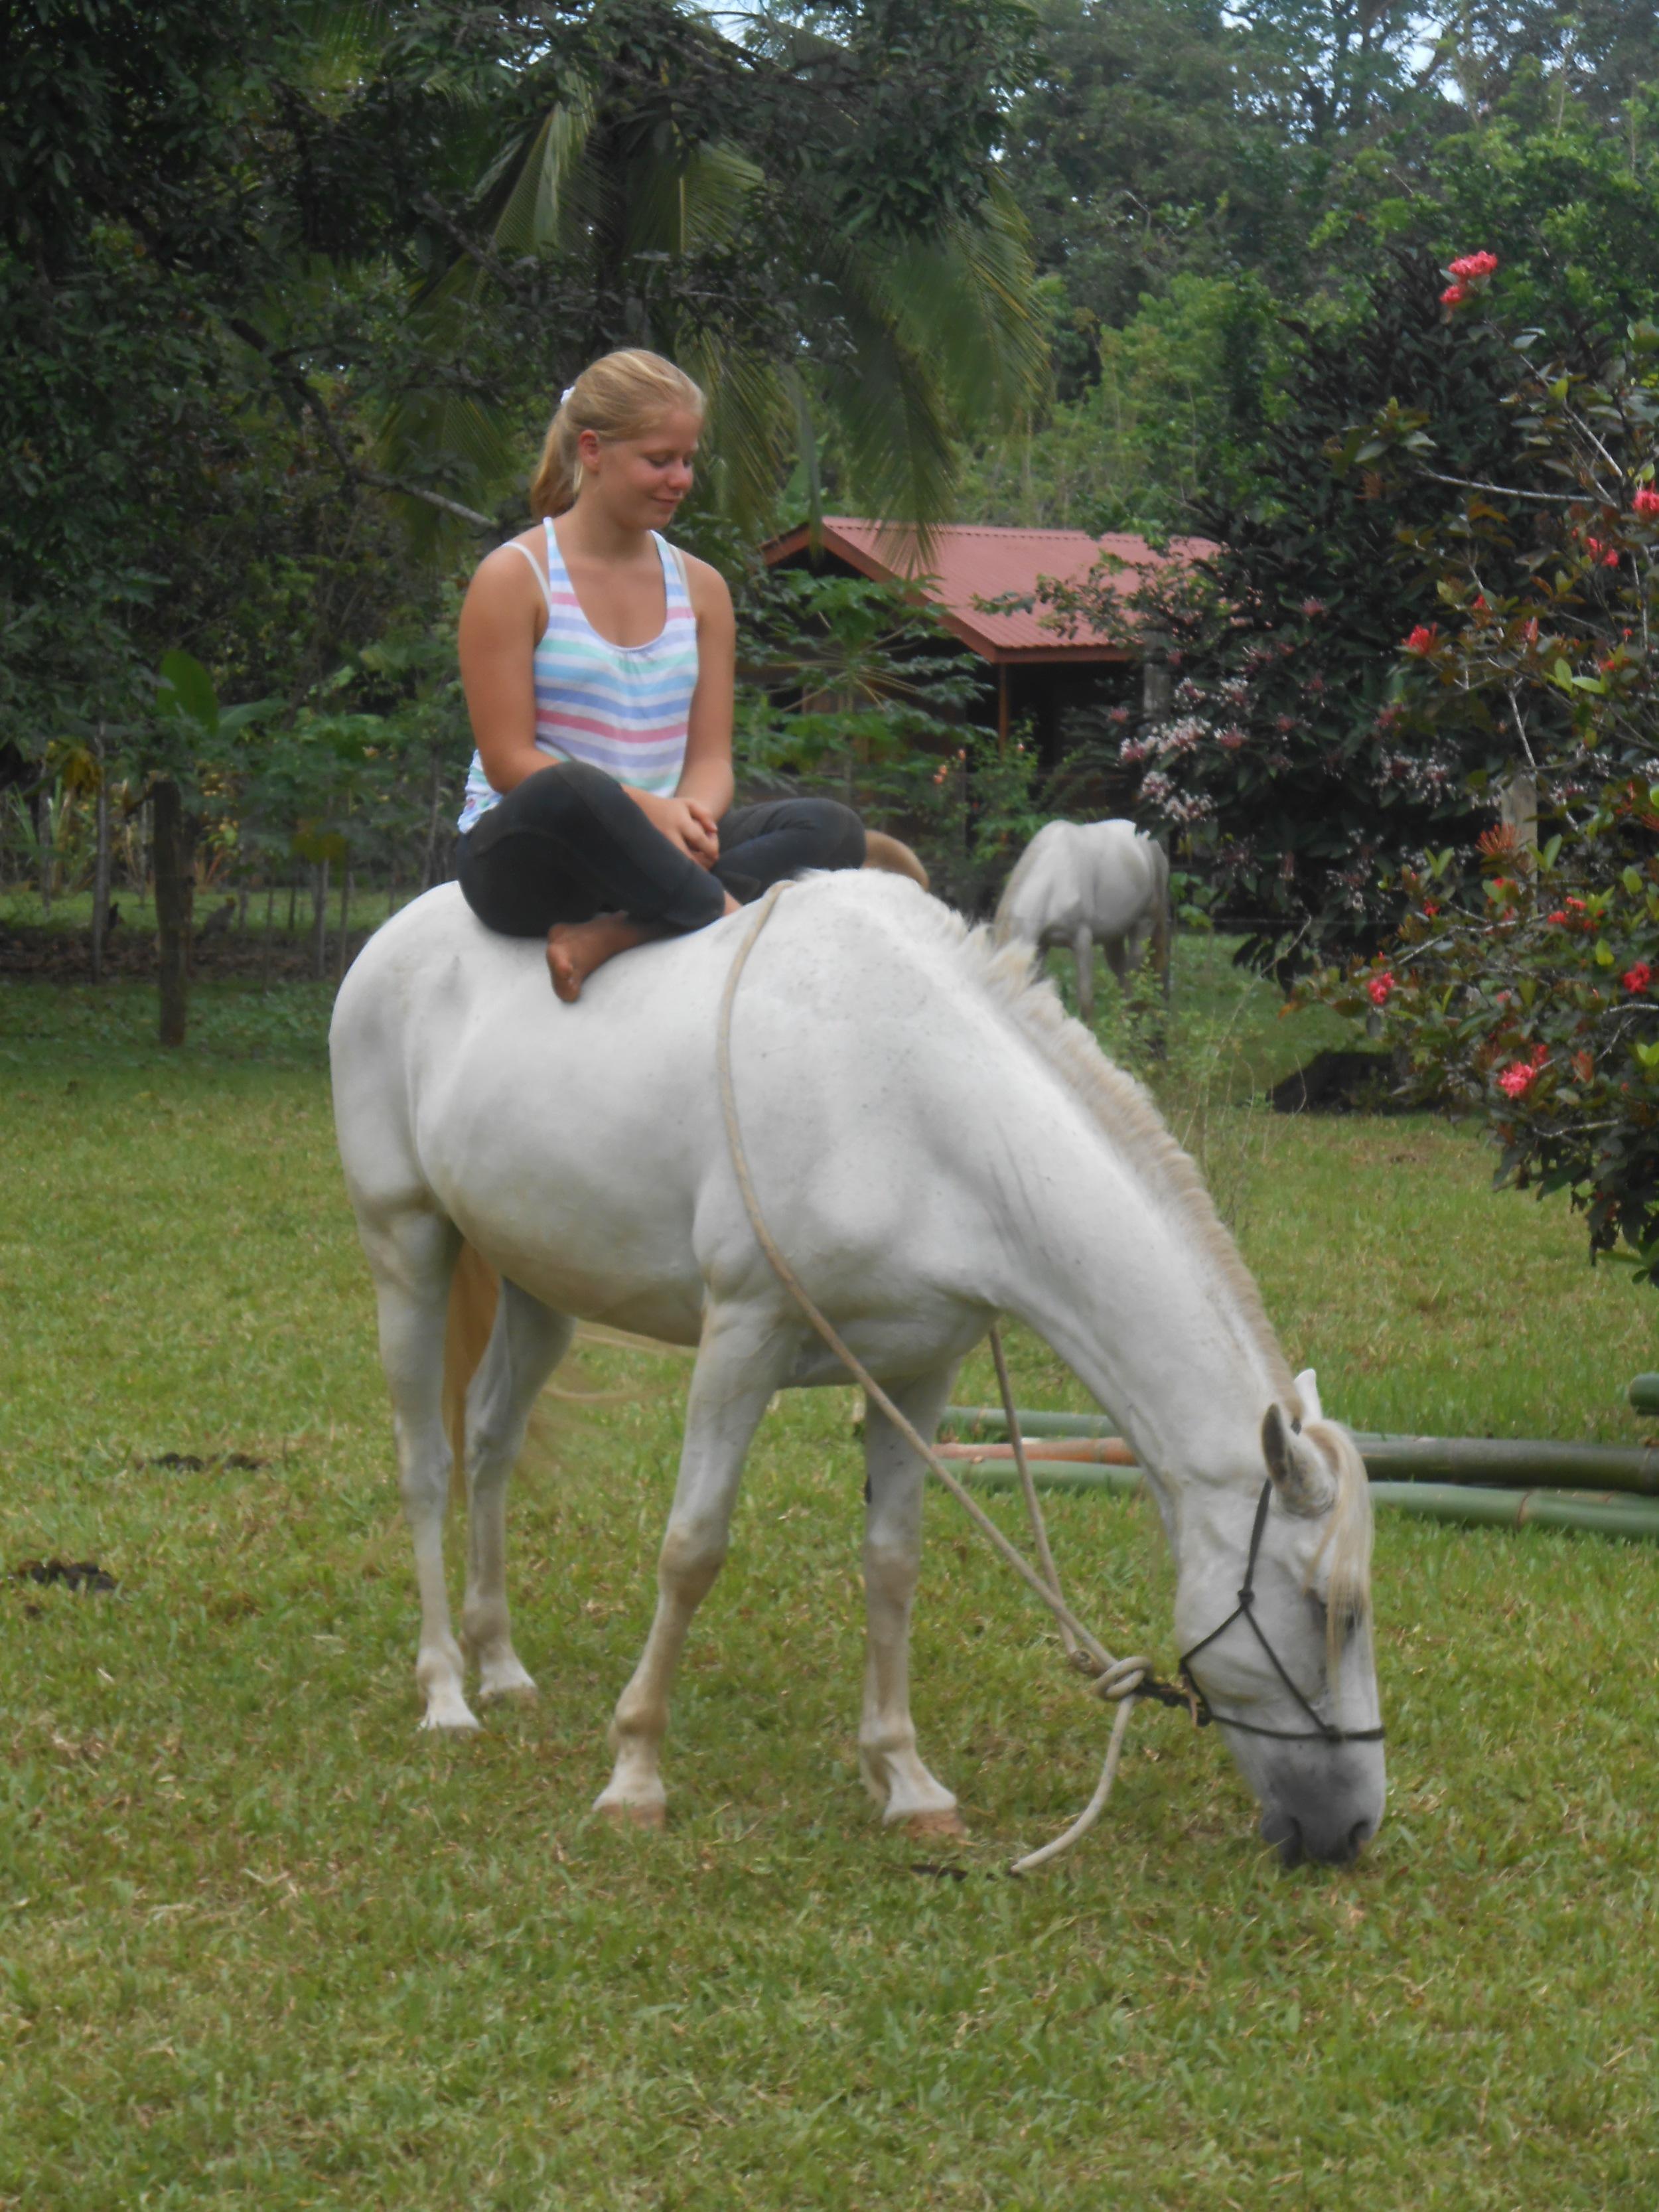 meditating on a horse